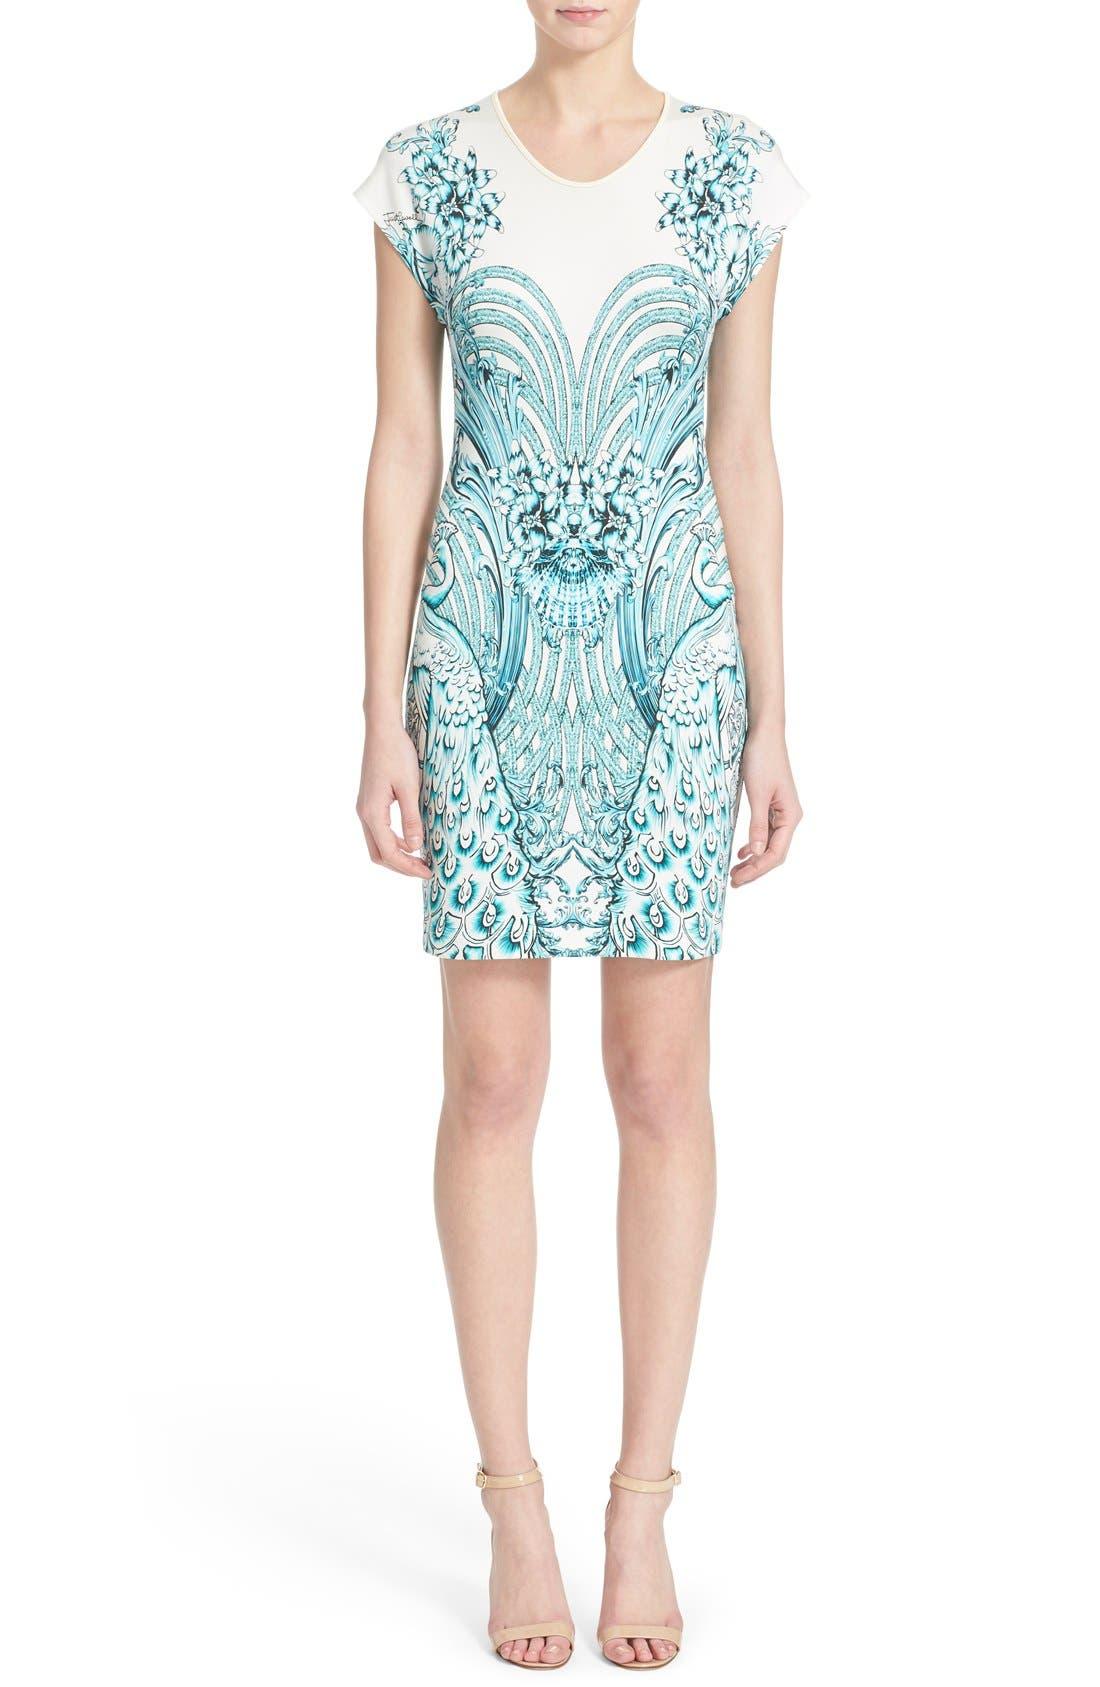 Main Image - Just Cavalli Peacock Jersey Body-Con Dress